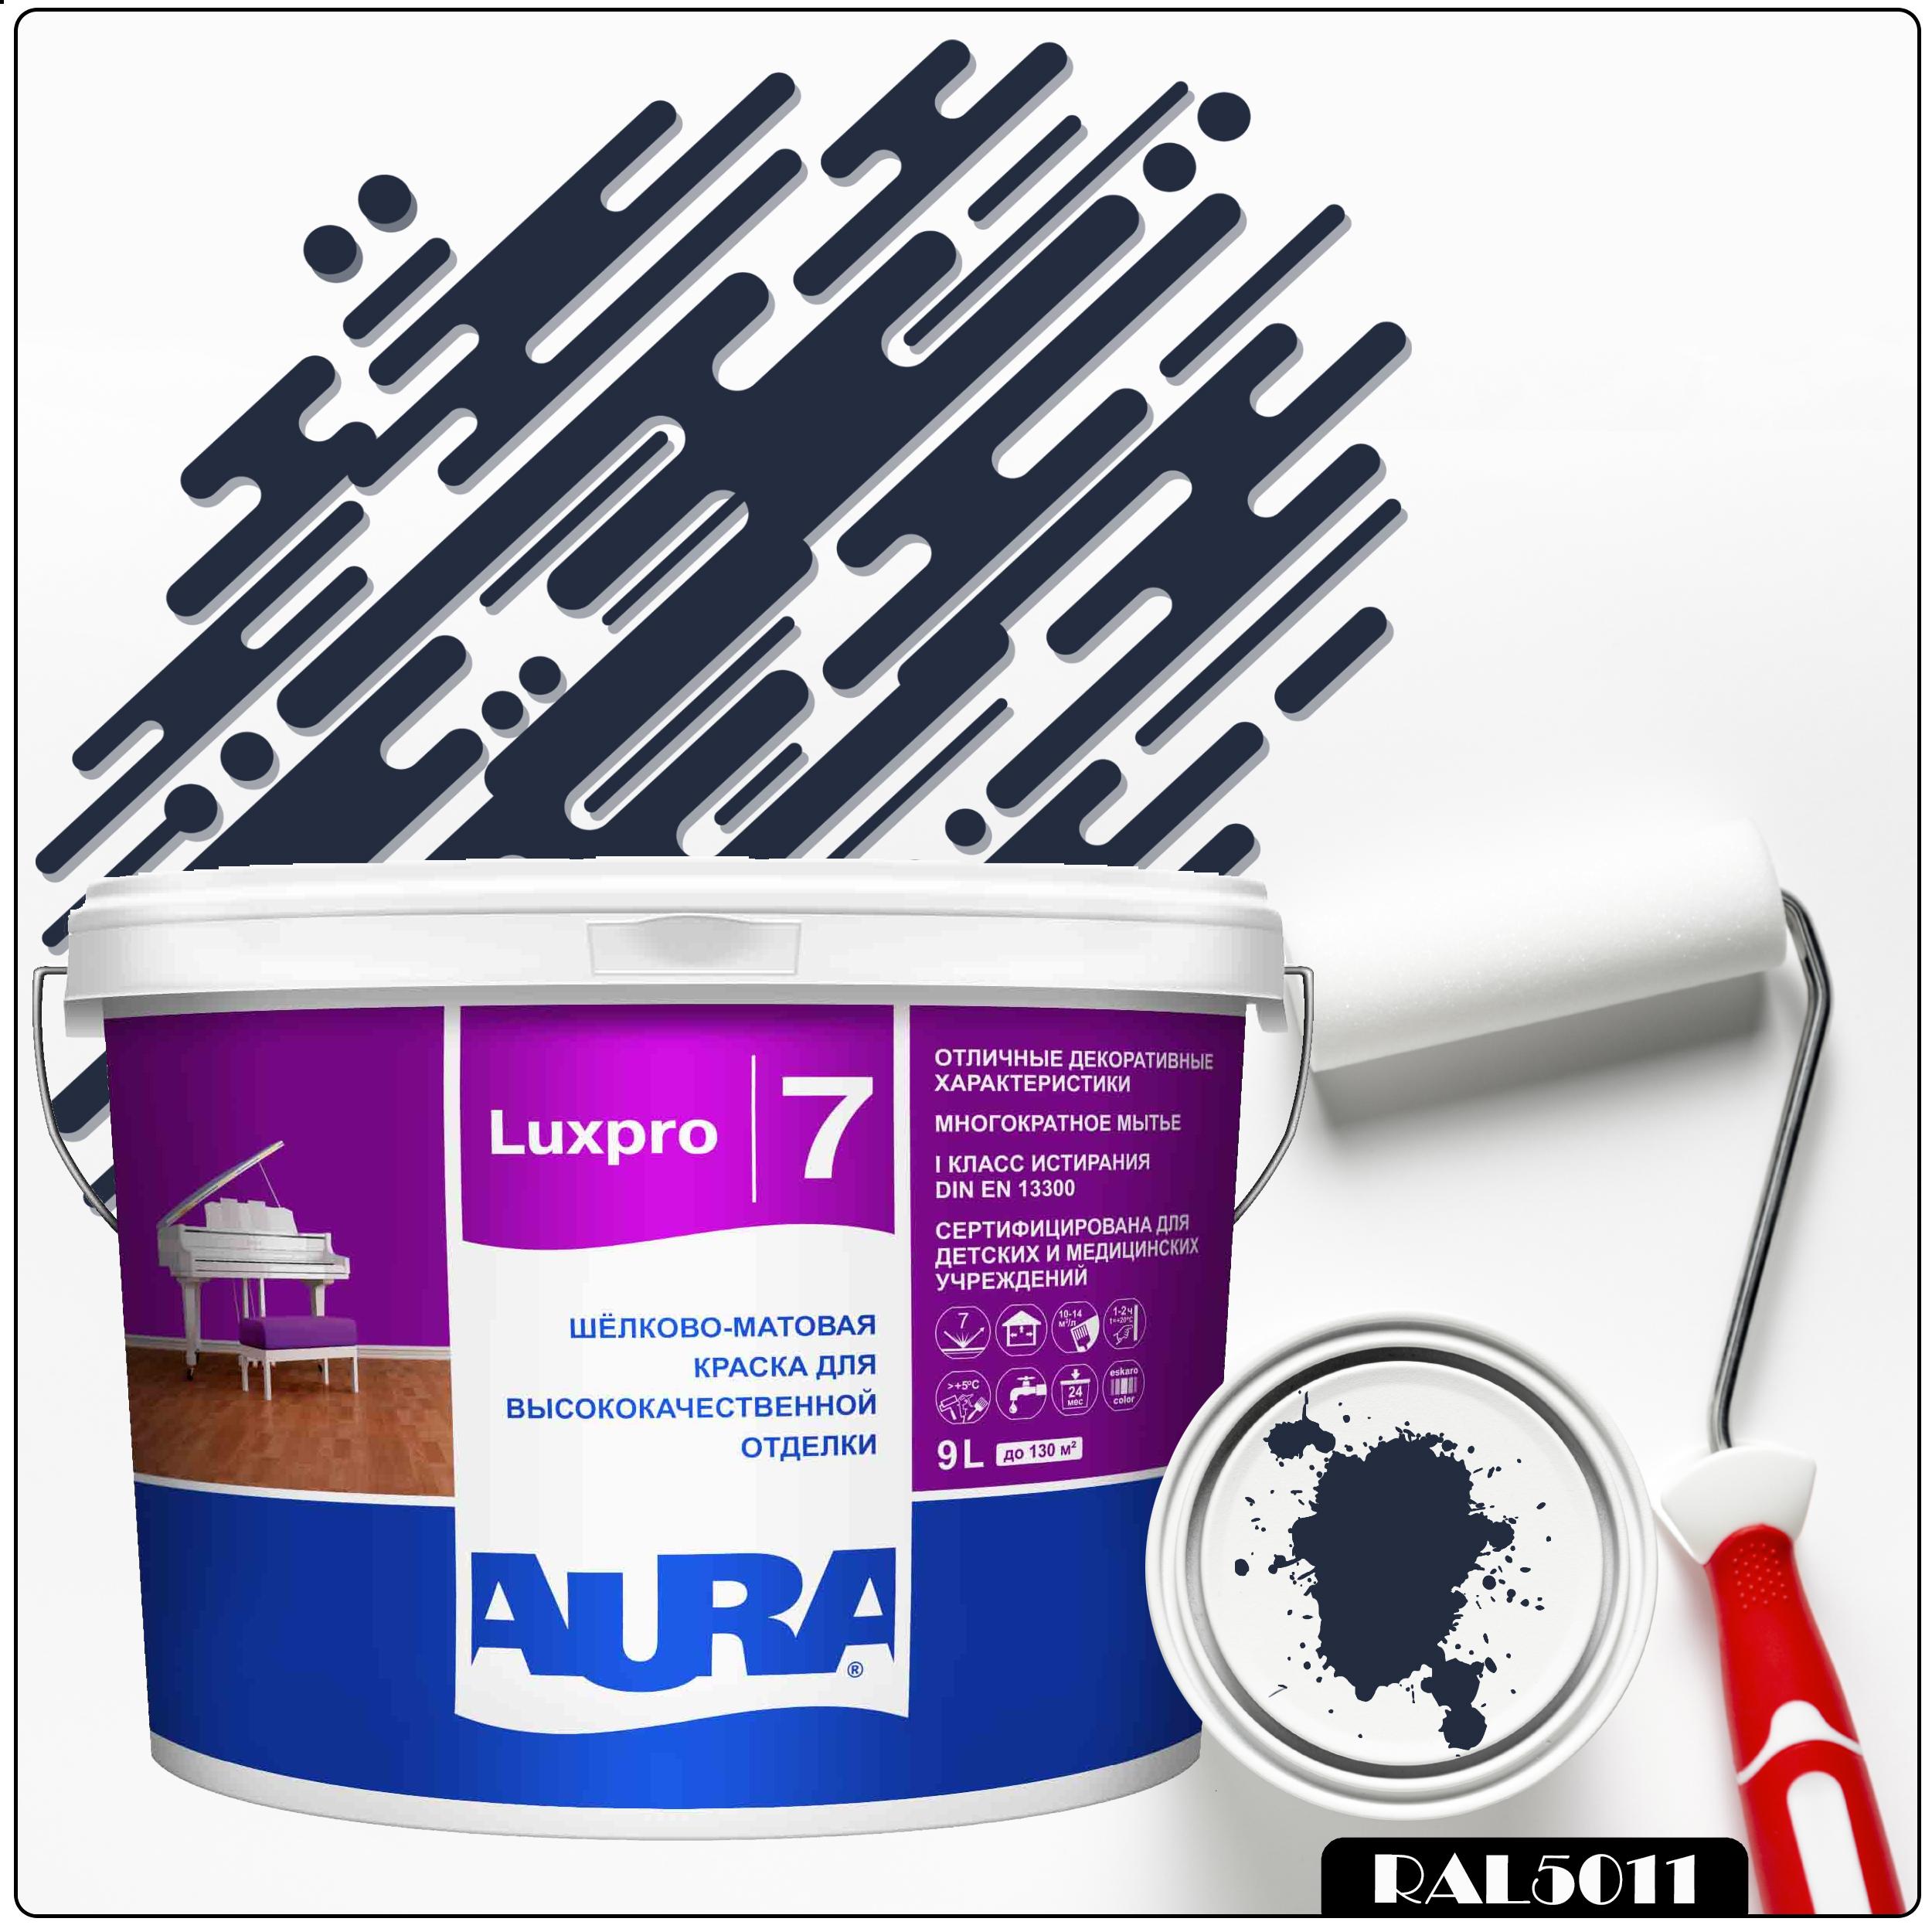 Фото 11 - Краска Aura LuxPRO 7, RAL 5011 Синяя сталь, латексная, шелково-матовая, интерьерная, 9л, Аура.